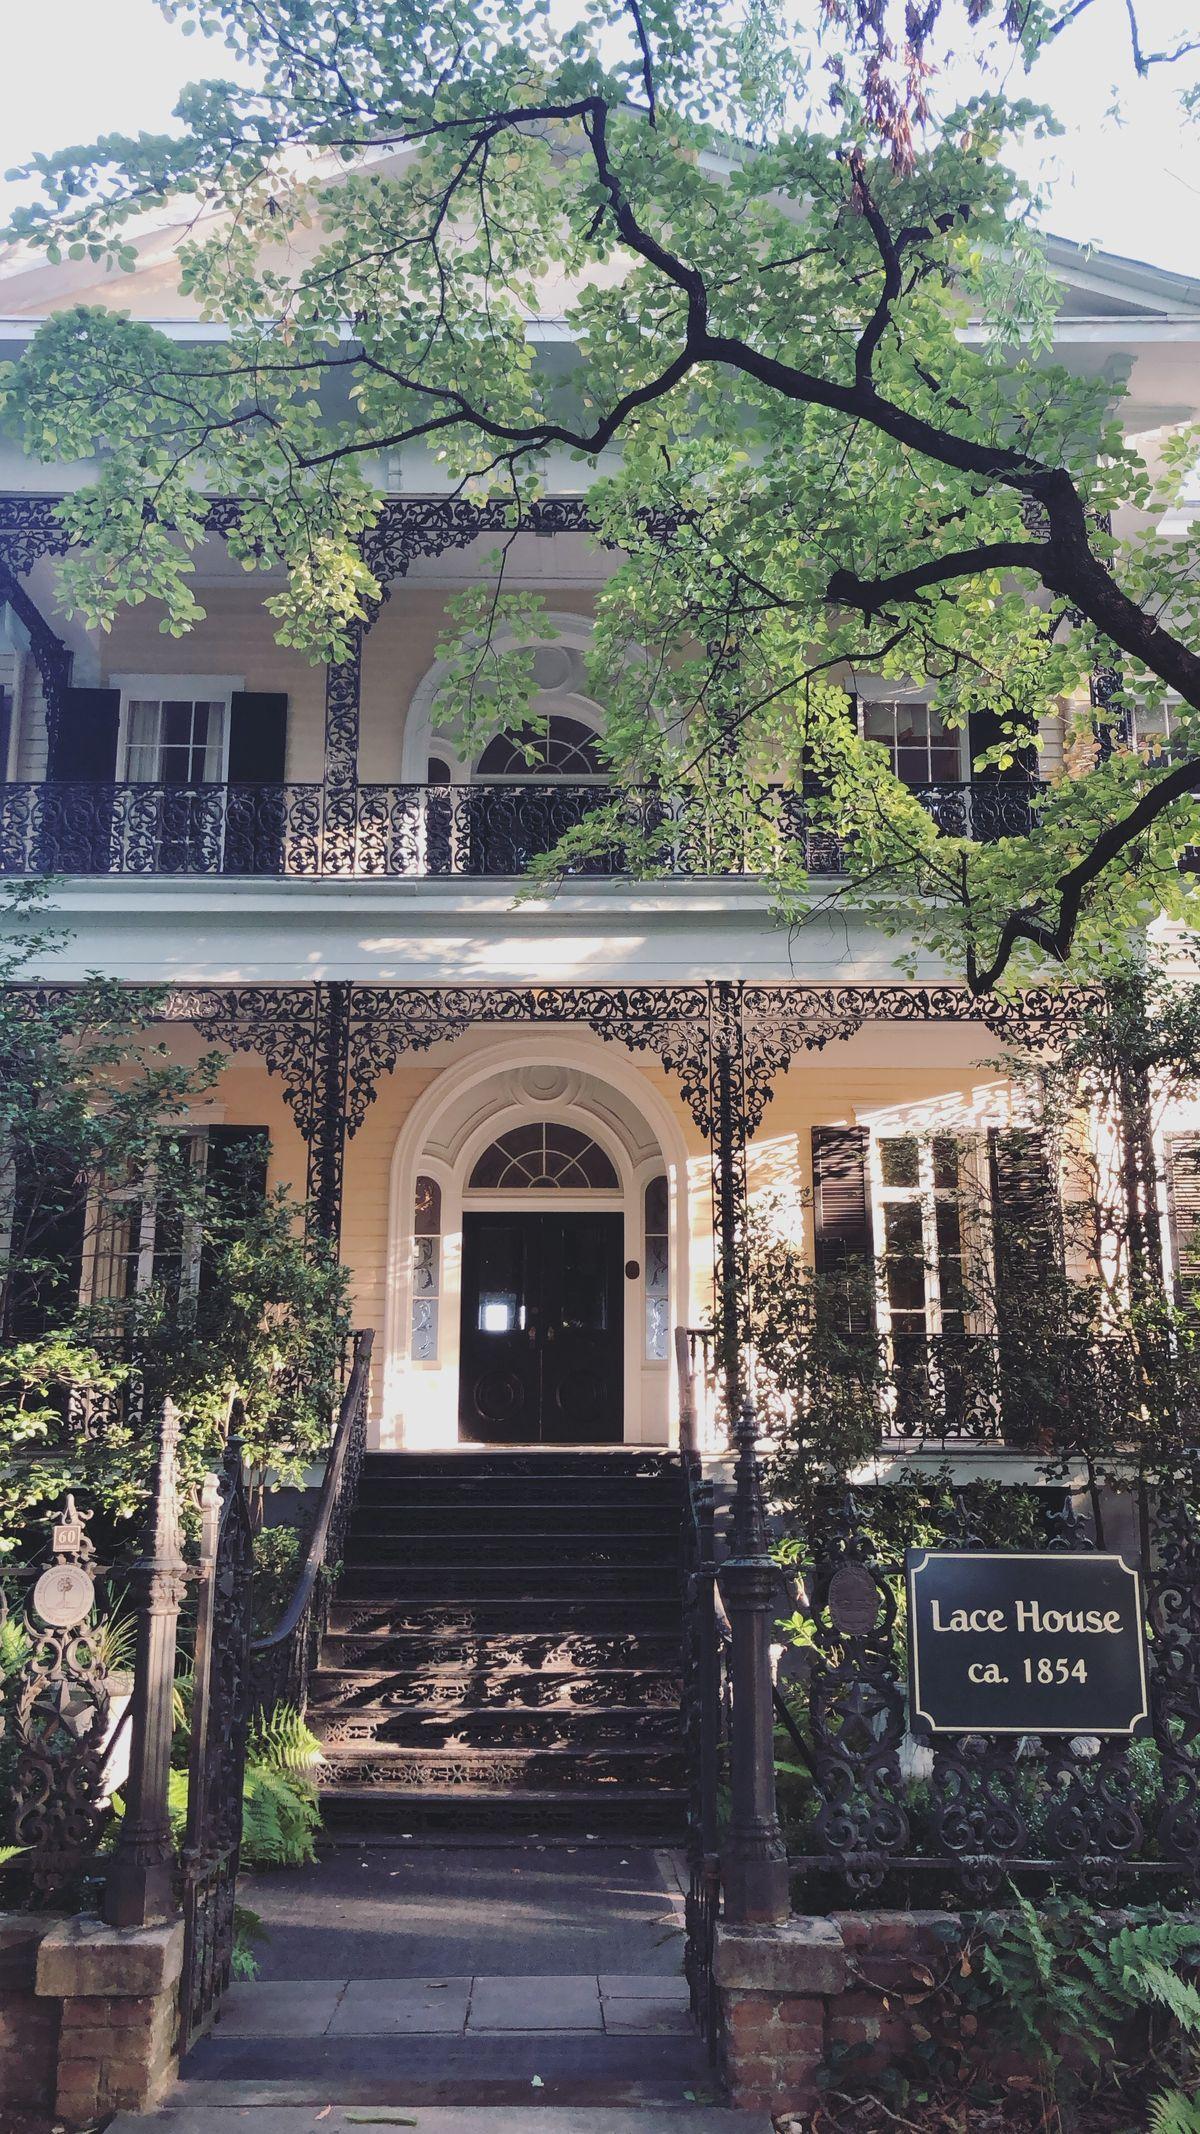 e011324203221fd08e8f53f5cc610ff6 - The Lace House And Gardens Columbia Sc